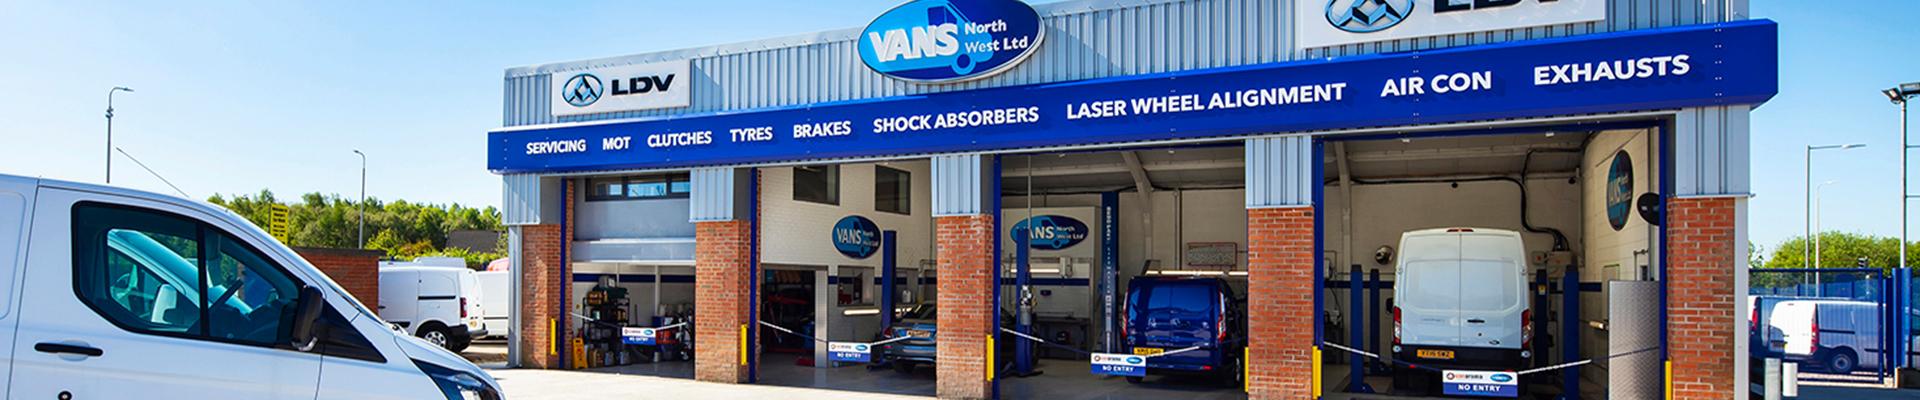 Vans North West Hero Image - Vans Northwest Ltd